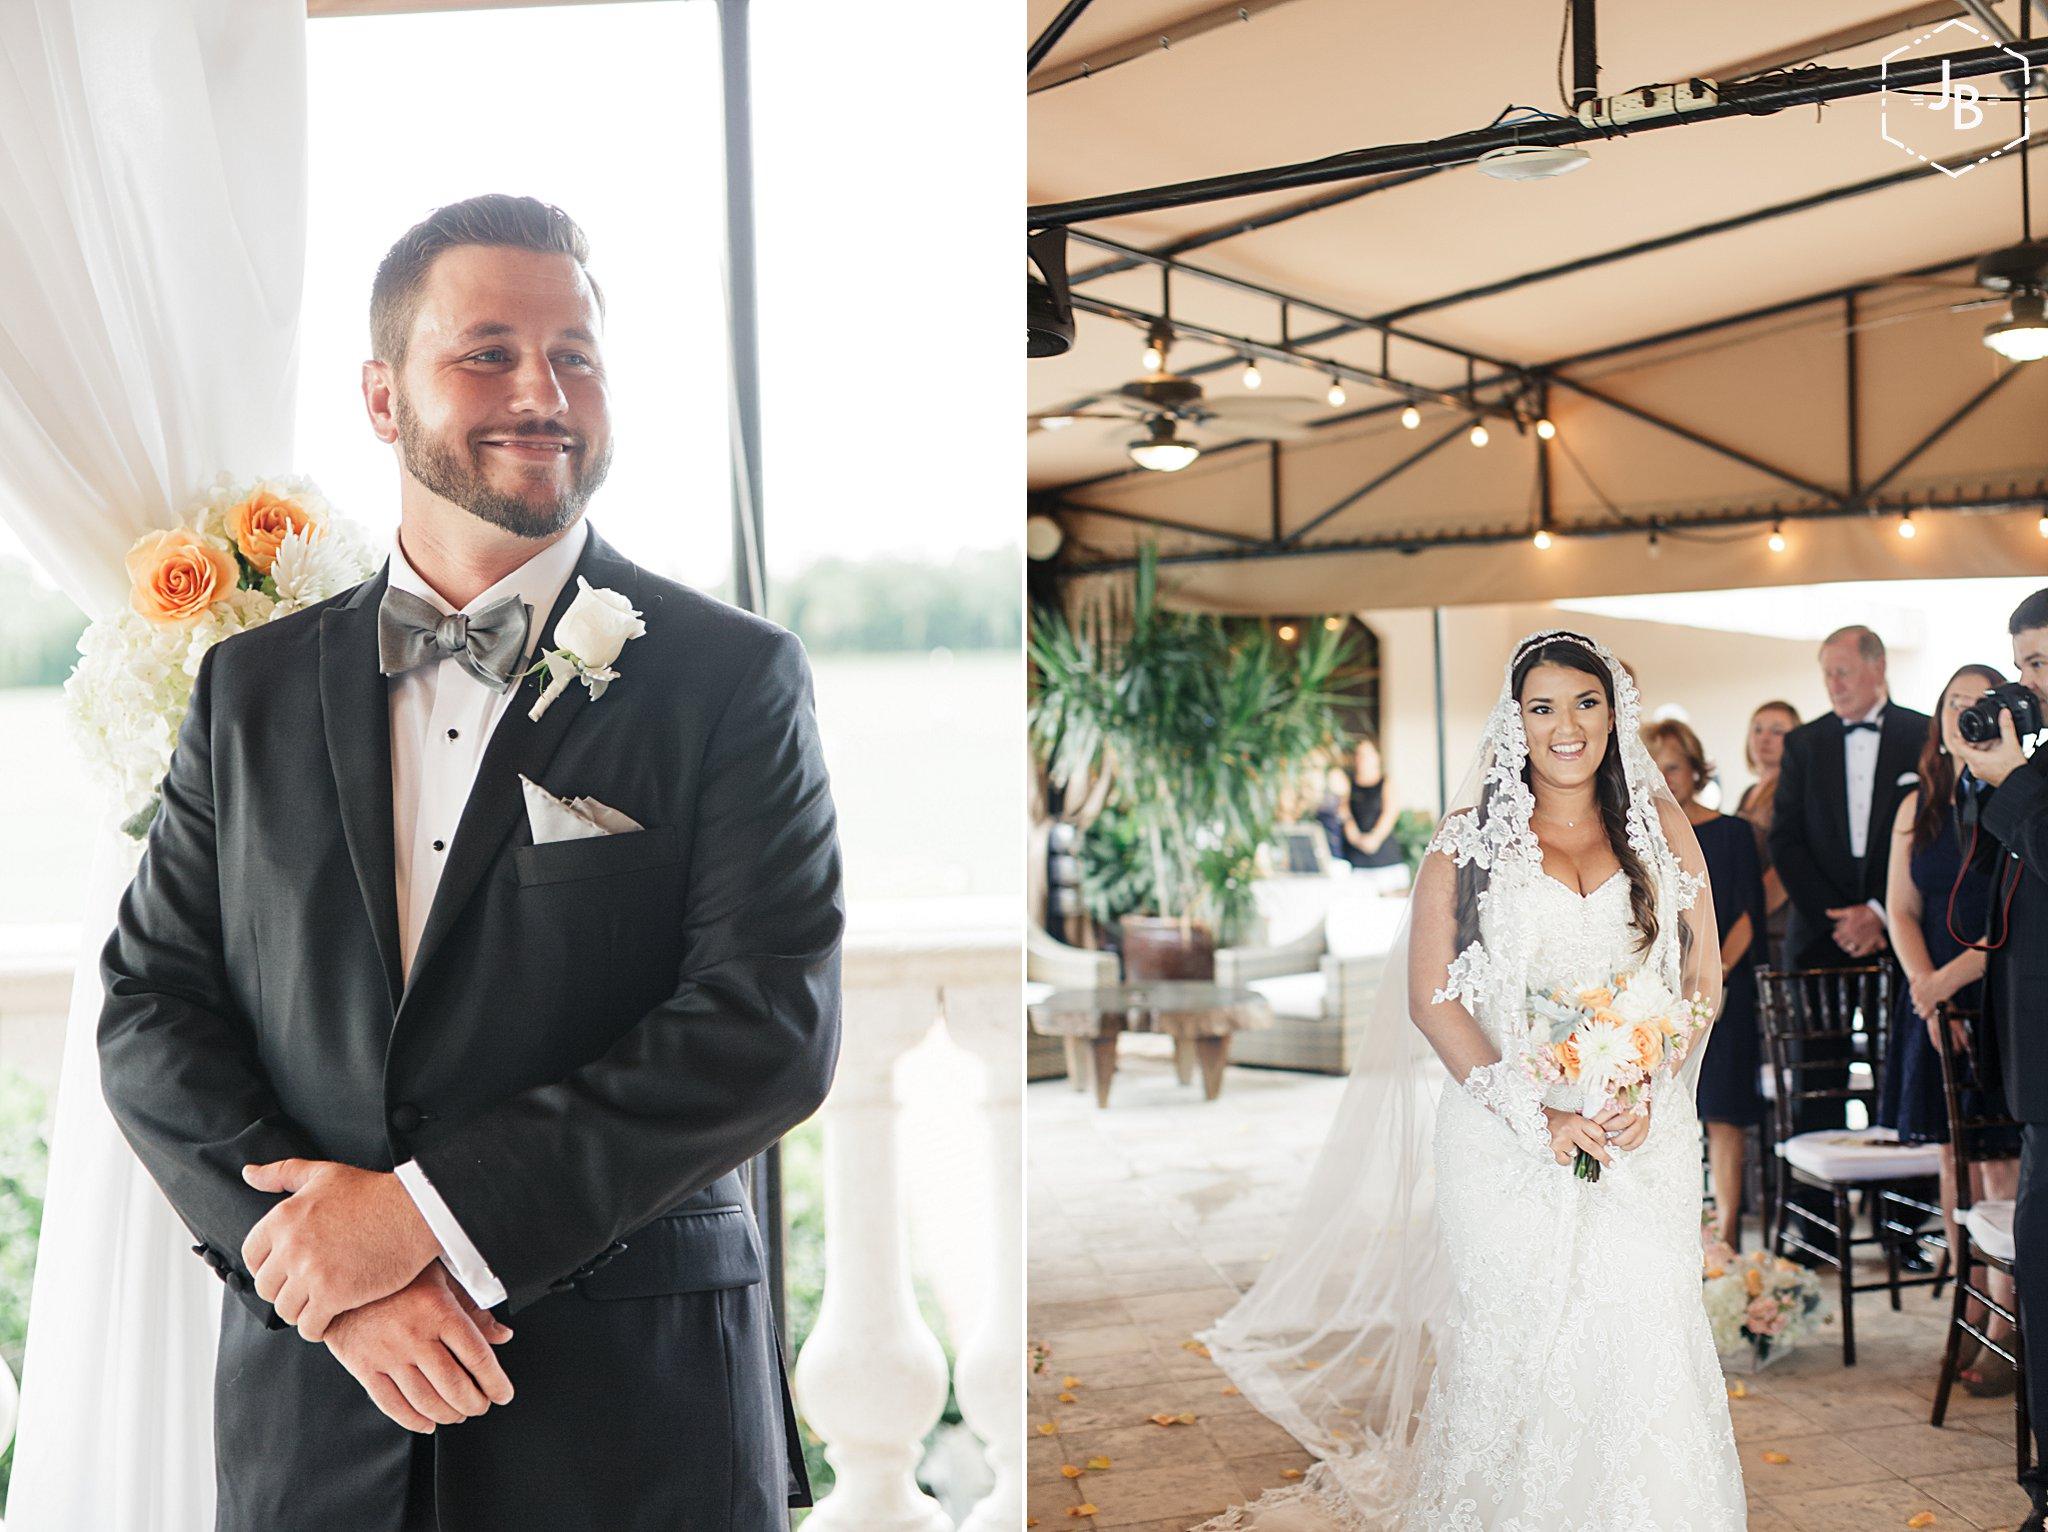 WeddingandEngagementFloridaPhotographer_2797.jpg